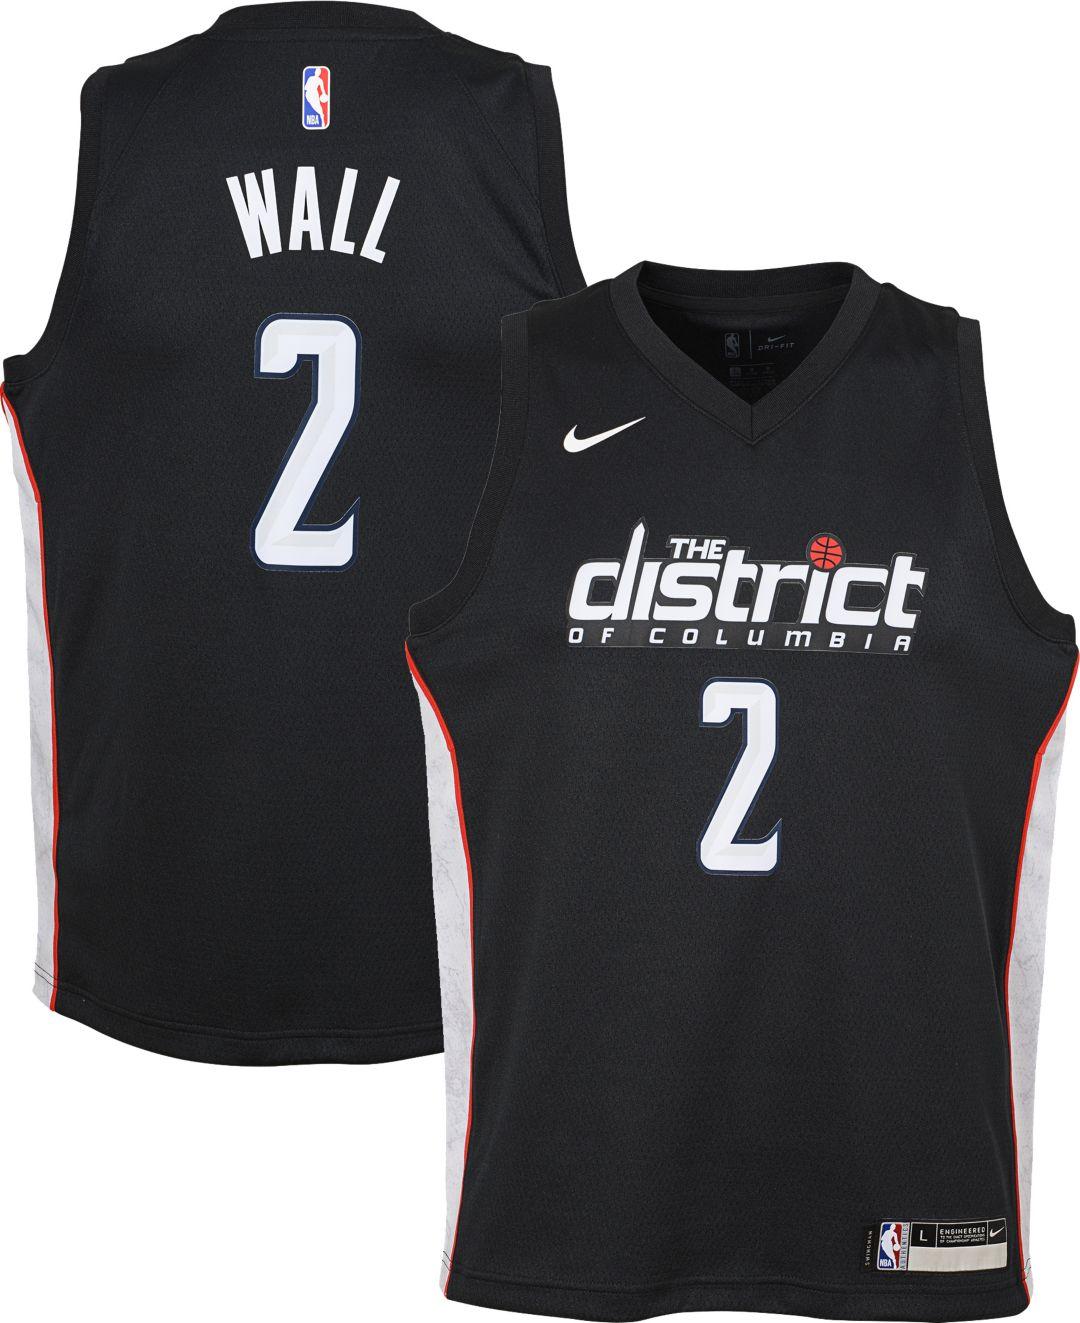 save off 78c3b 9d6fd Nike Youth Washington Wizards John Wall Dri-FIT City Edition Swingman Jersey.  noImageFound. Previous